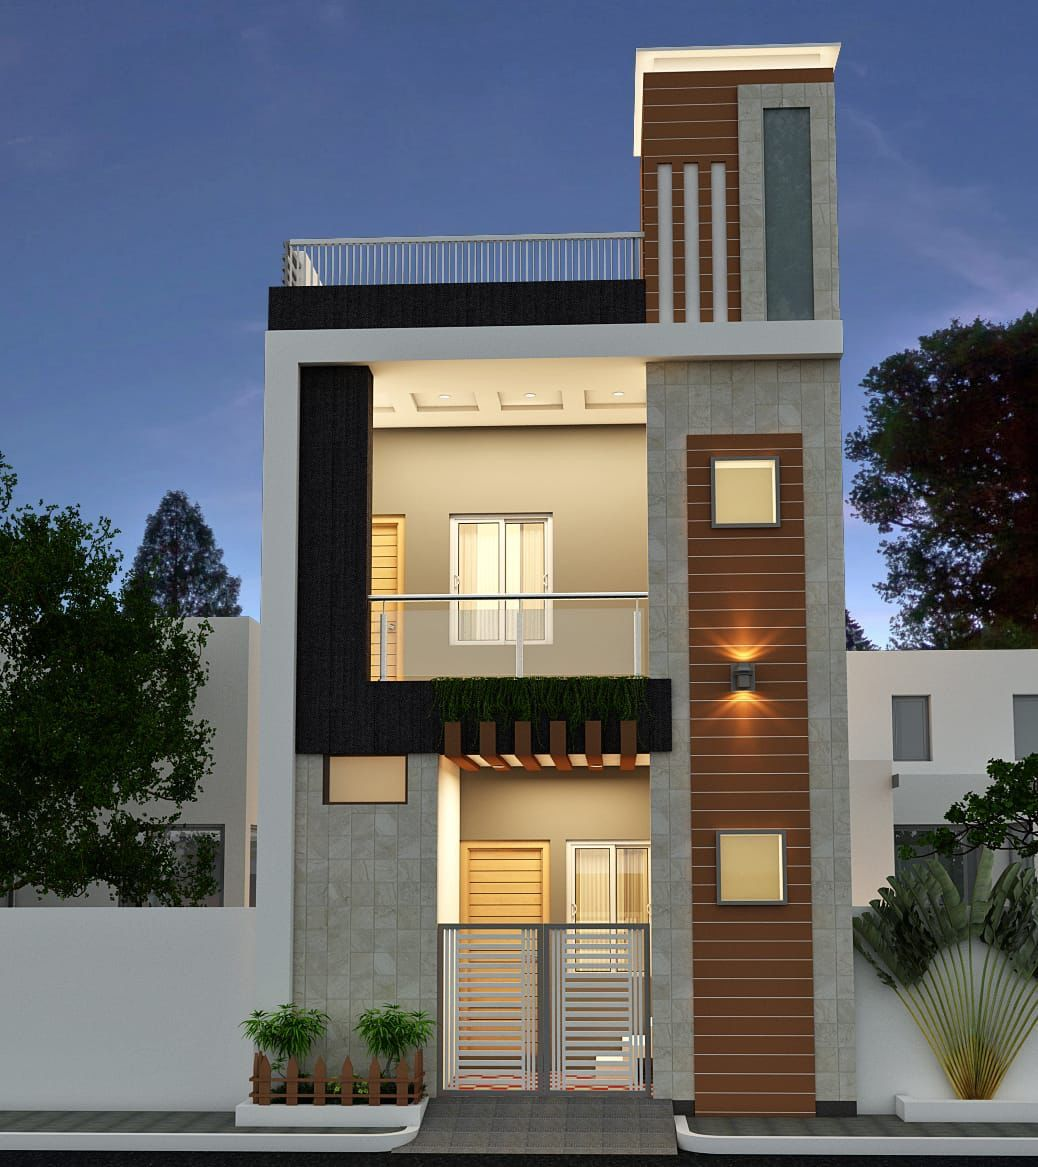 Home Design Ideas India: Simple House Designs Exterior Indian + Simple House Design